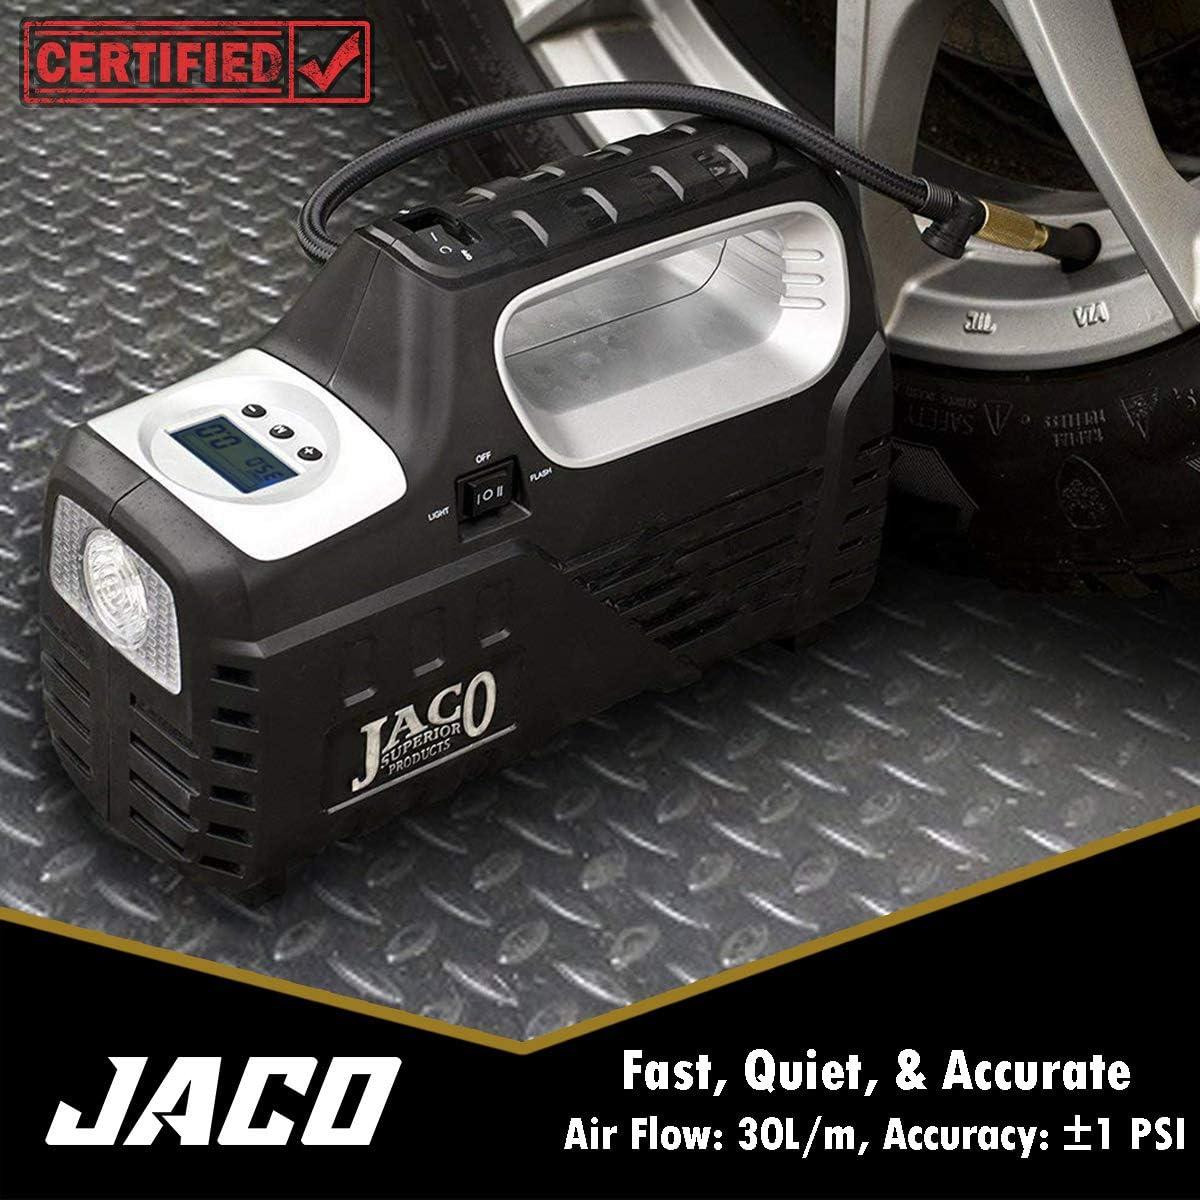 JACO SmartPro 2.0 AC/DC Digital Tire Inflator